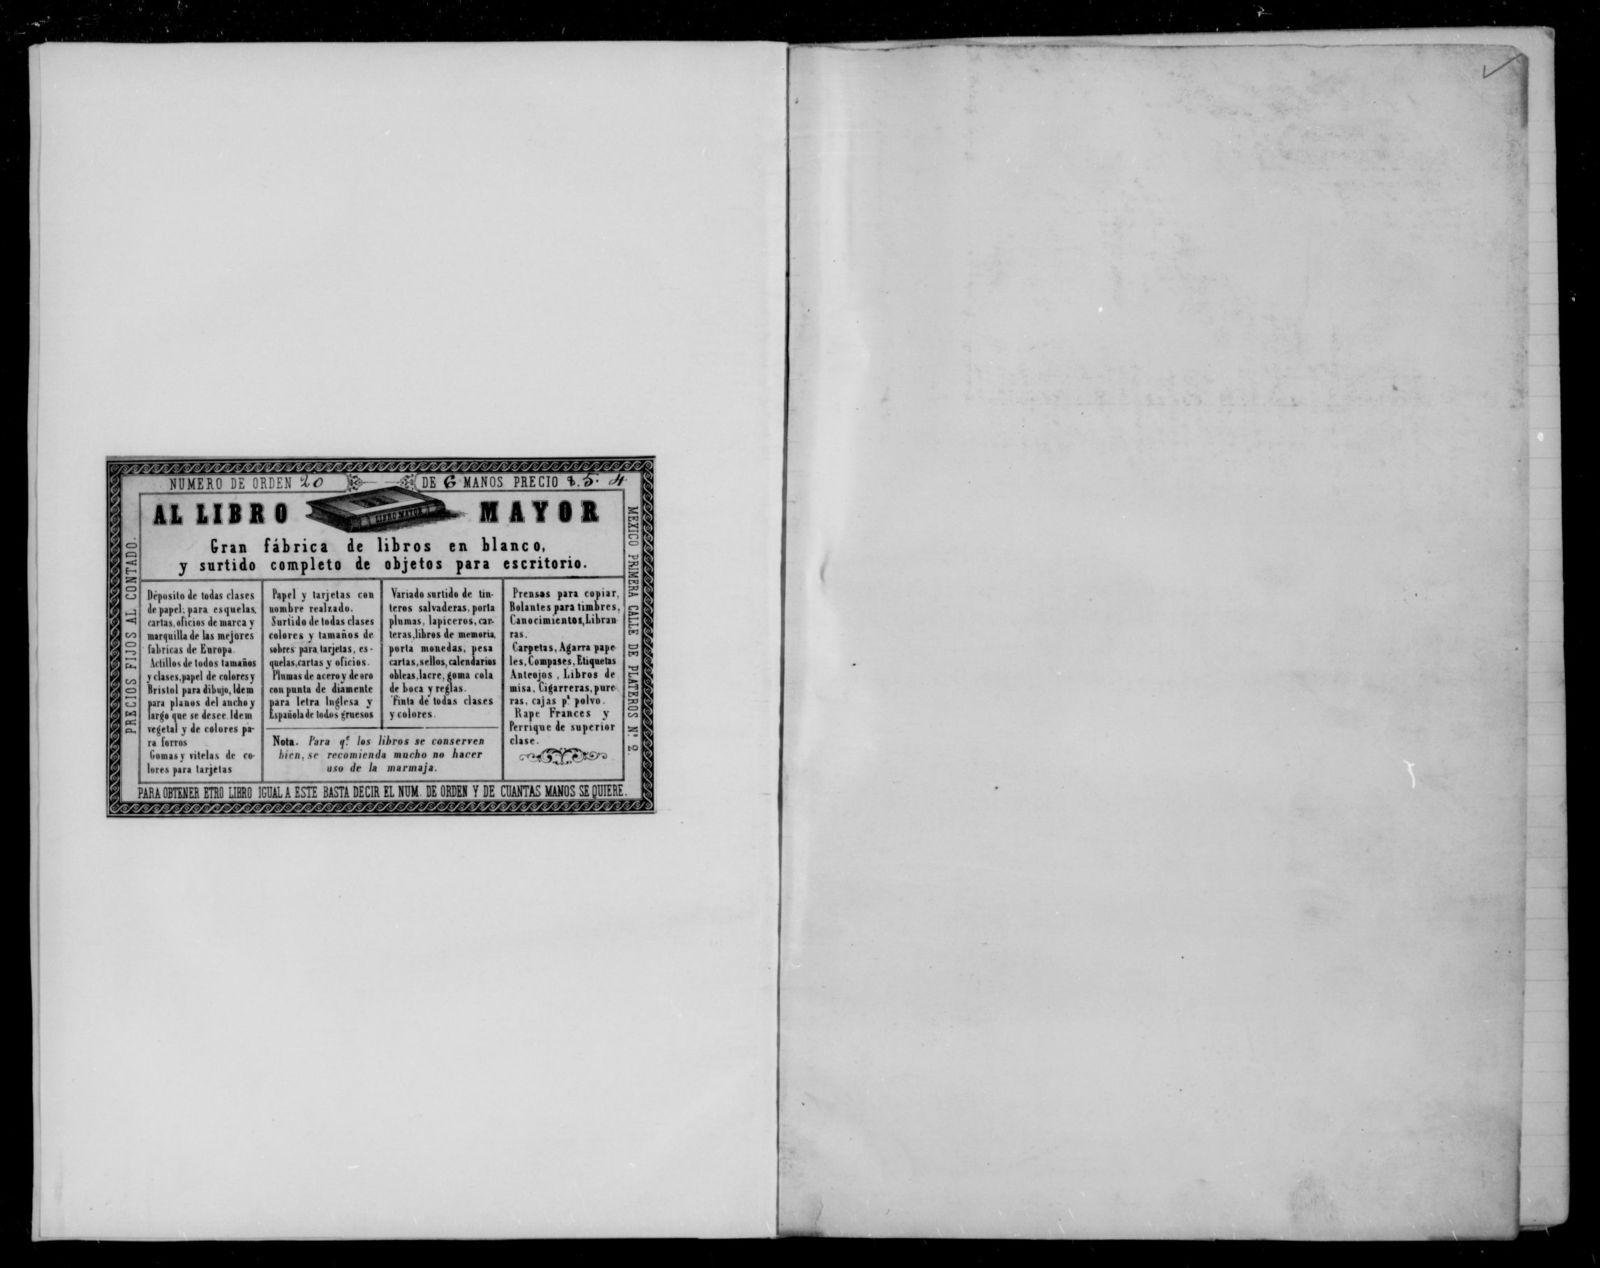 Confederate States of America records: Microfilm Reel 5